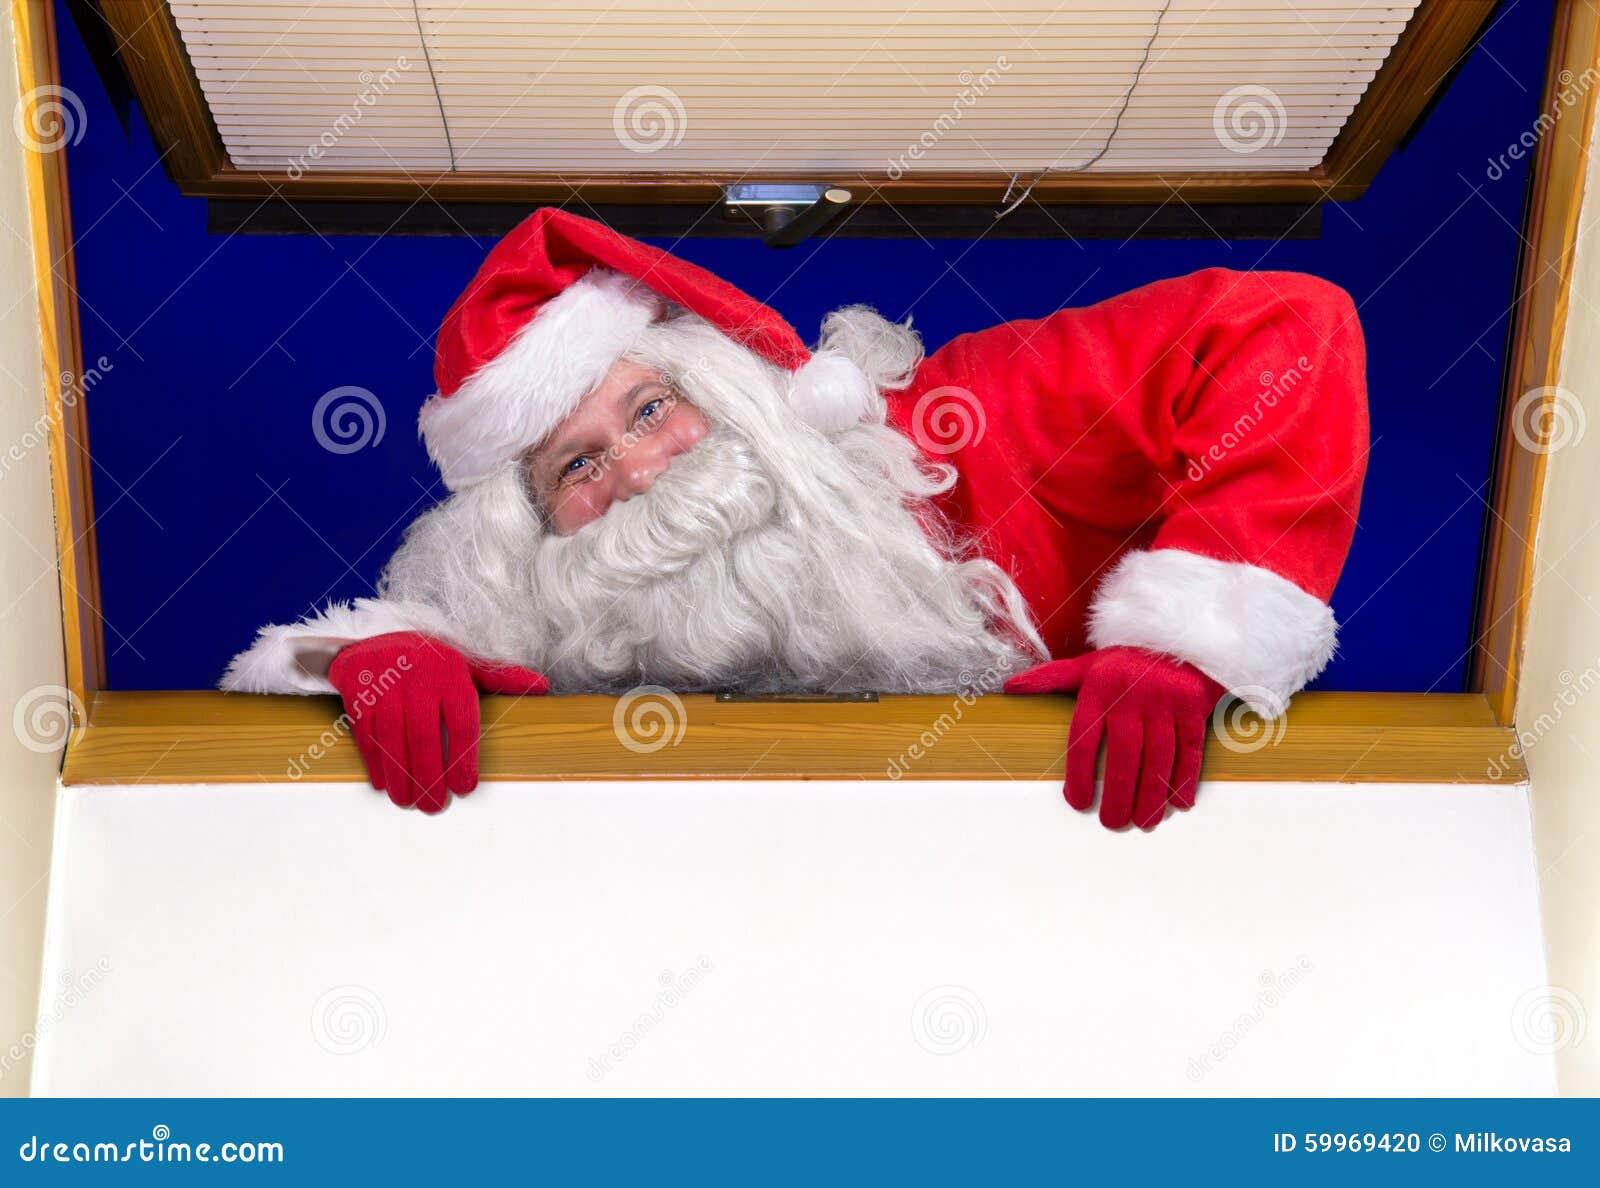 Santa Claus Climbs At Open Window Stock Photo Image